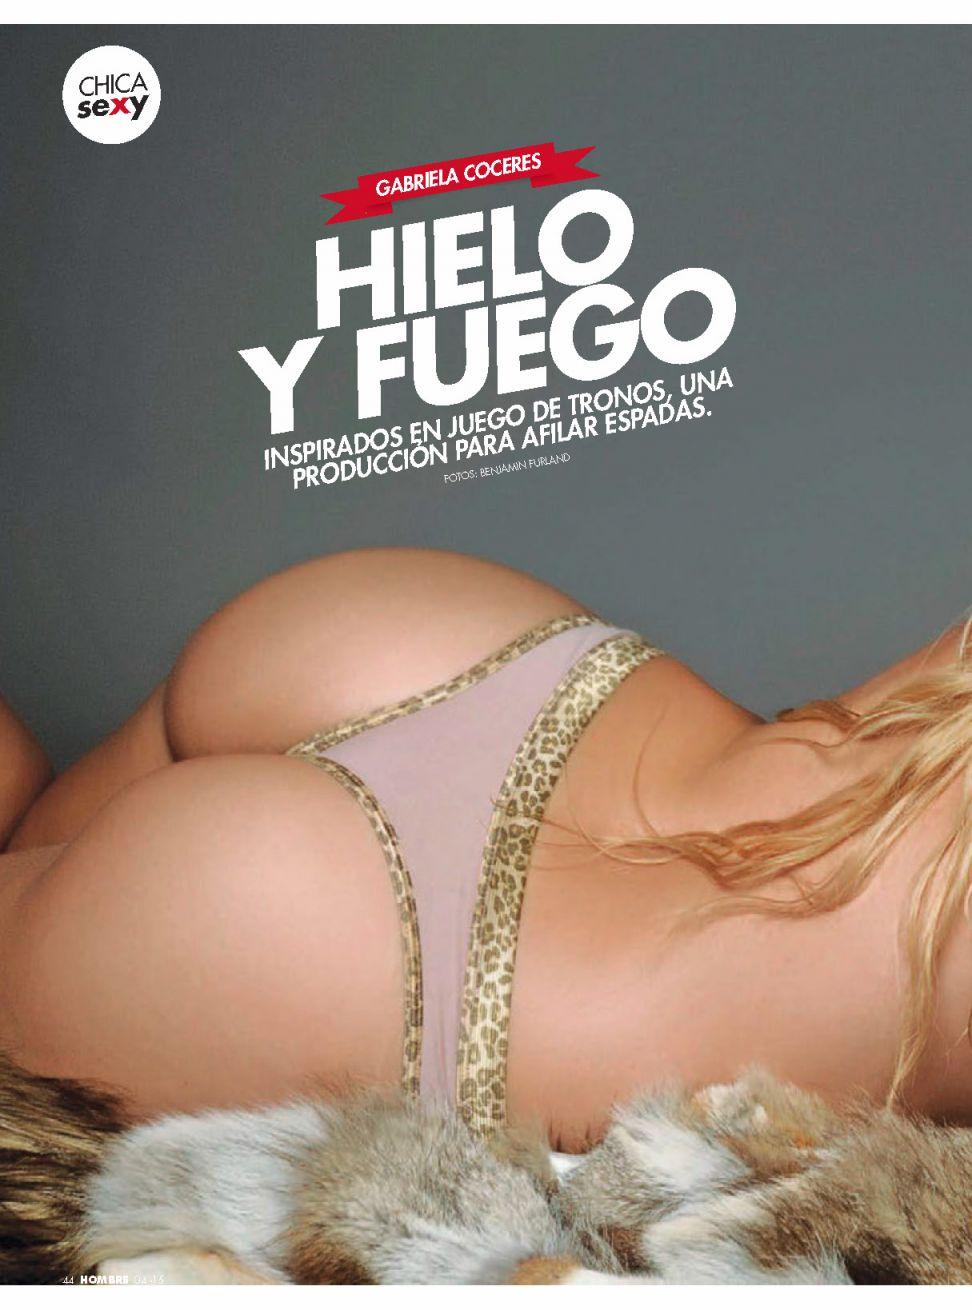 Gabriela Coceres topless (2)